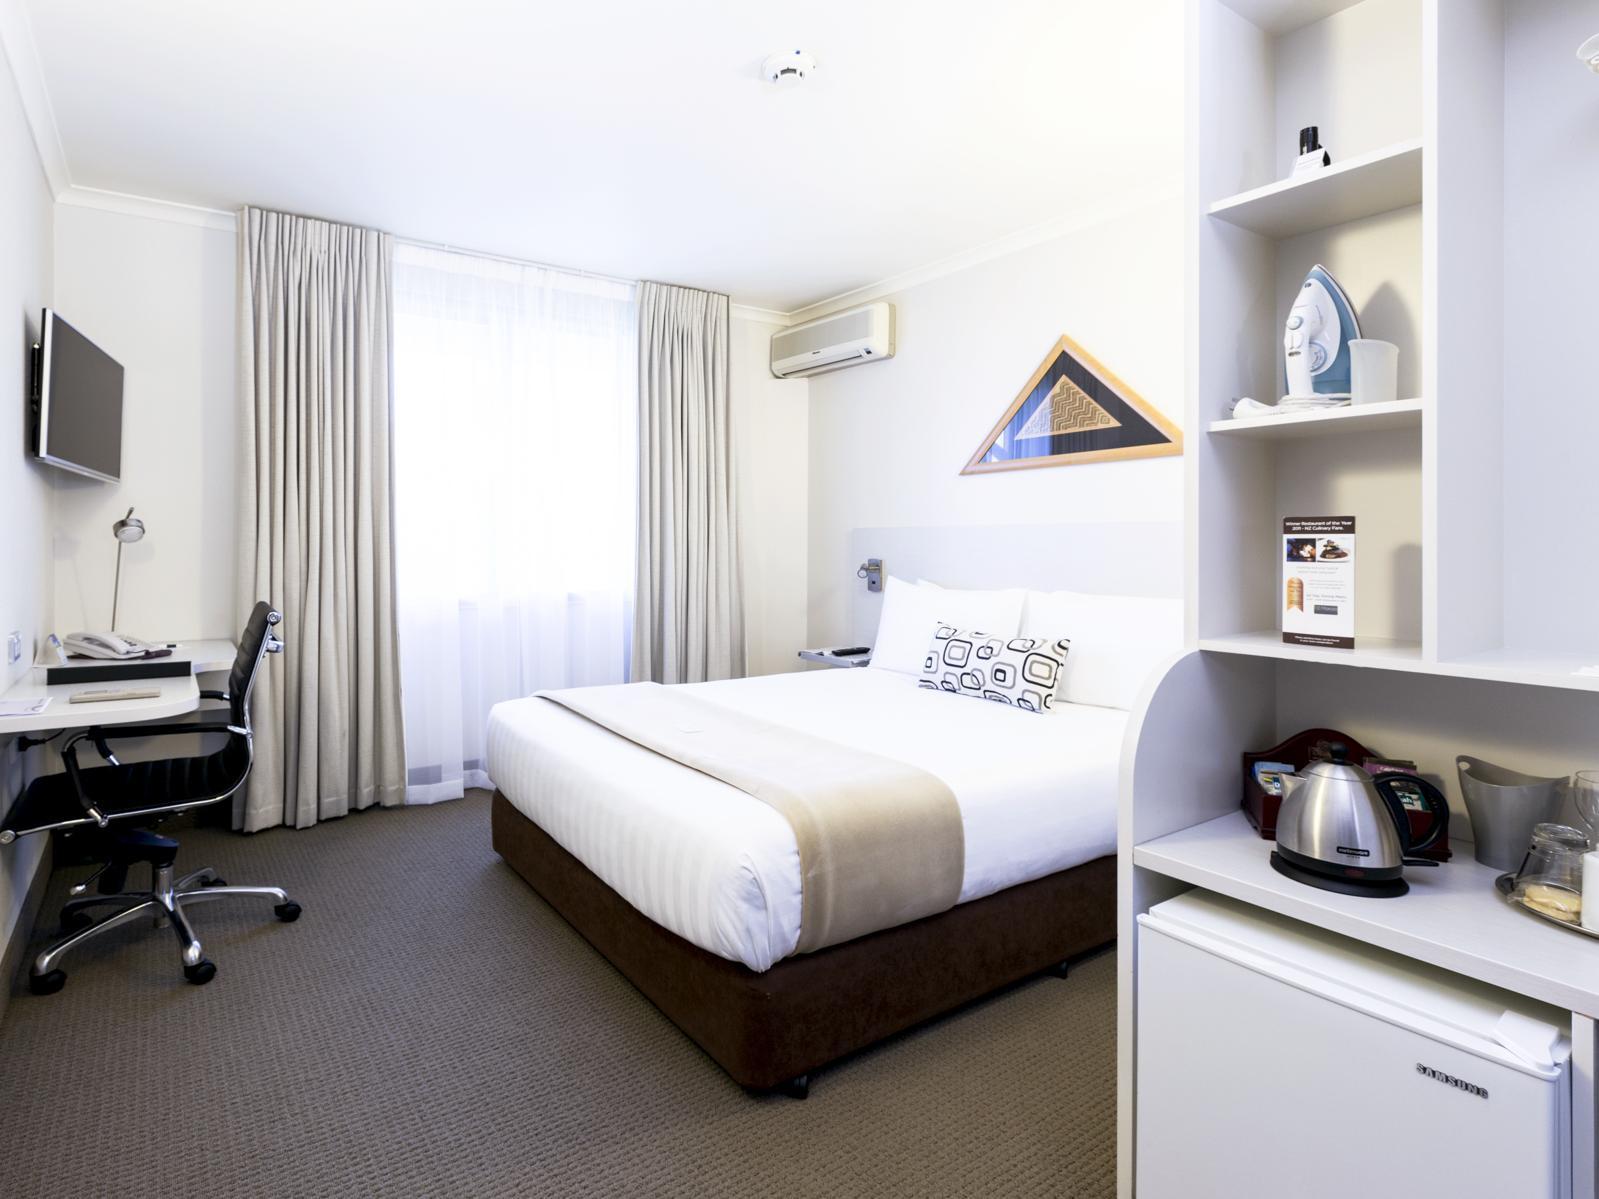 Jet Park Hotel Auckland Airport, Manukau